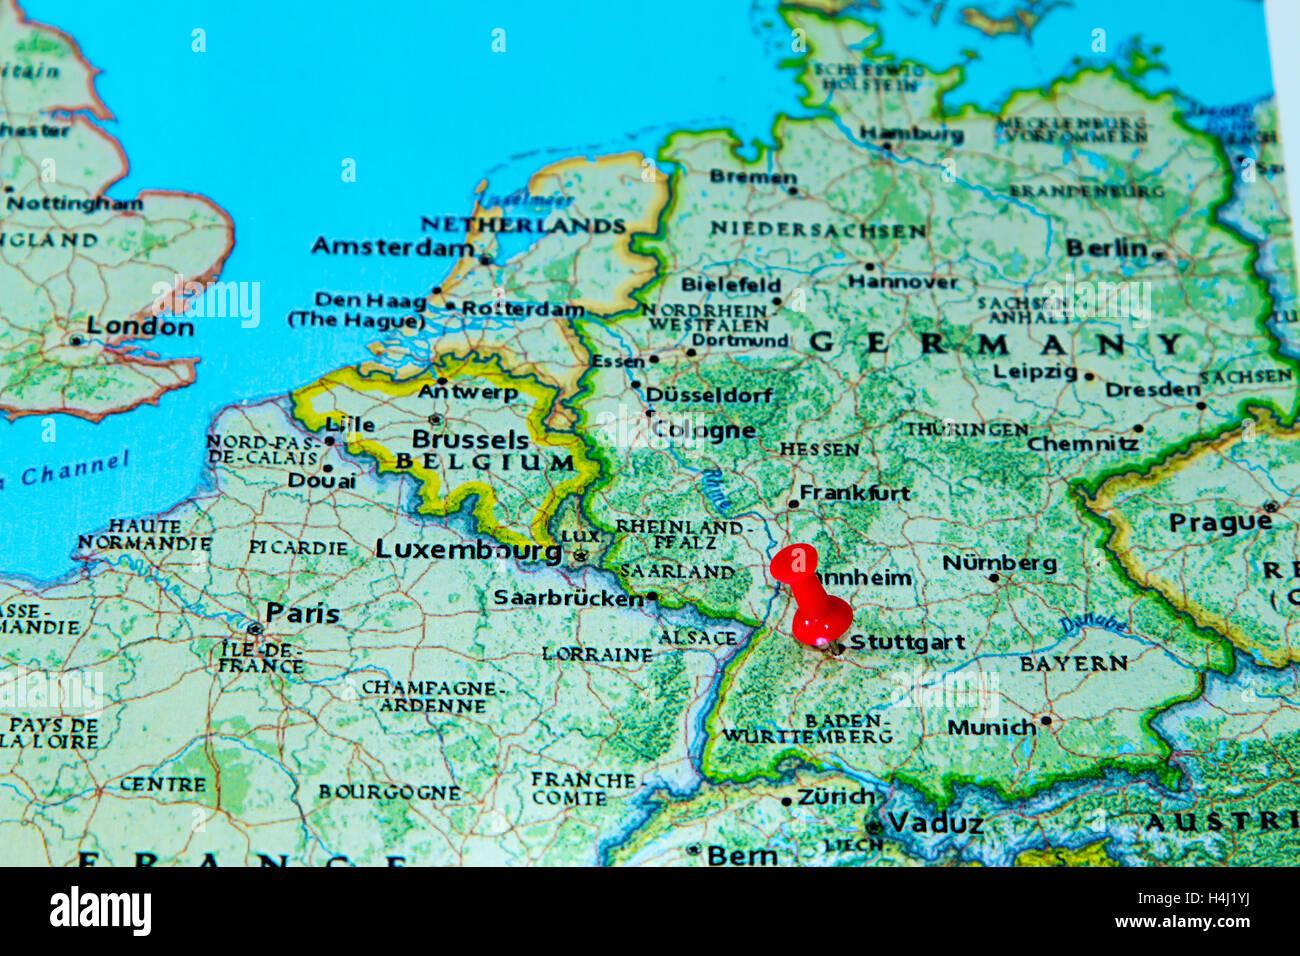 Stuttgart Germany Pinned On A Map Of Europe Stock Photo Royalty - Germany map stuttgart